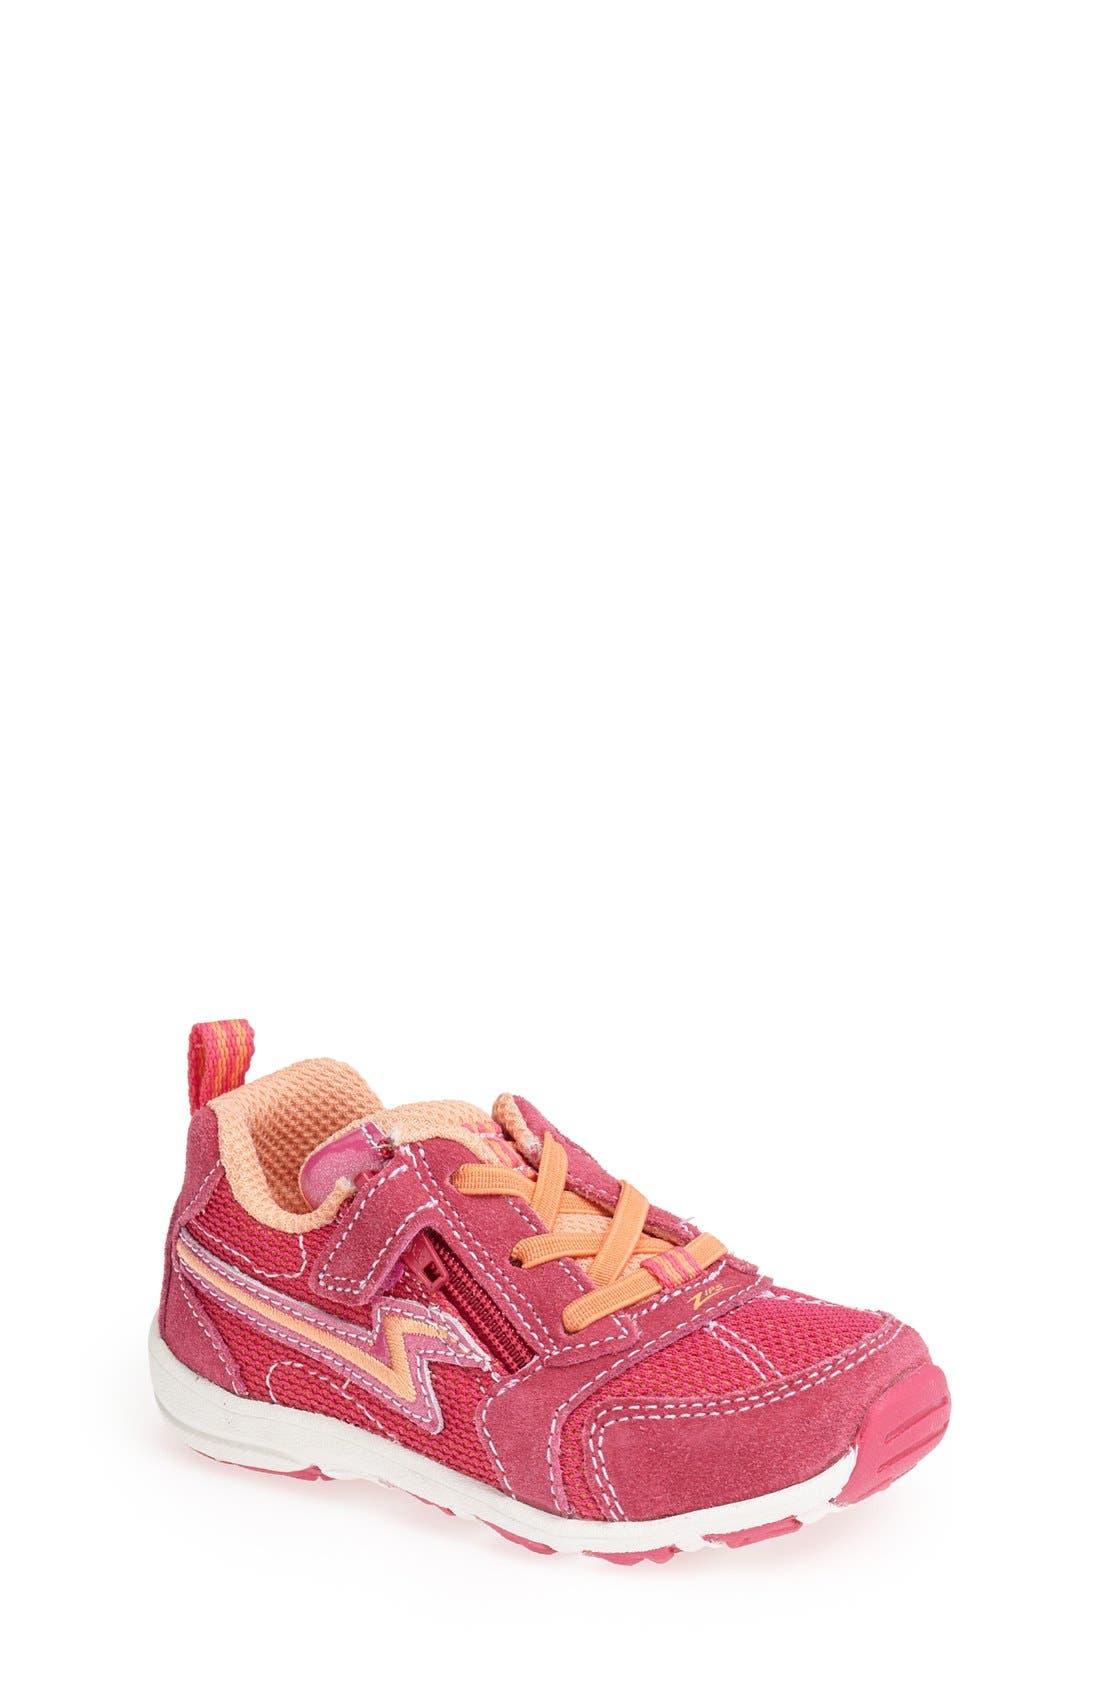 Alternate Image 1 Selected - Stride Rite 'Zips' Sneaker (Walker & Toddler)